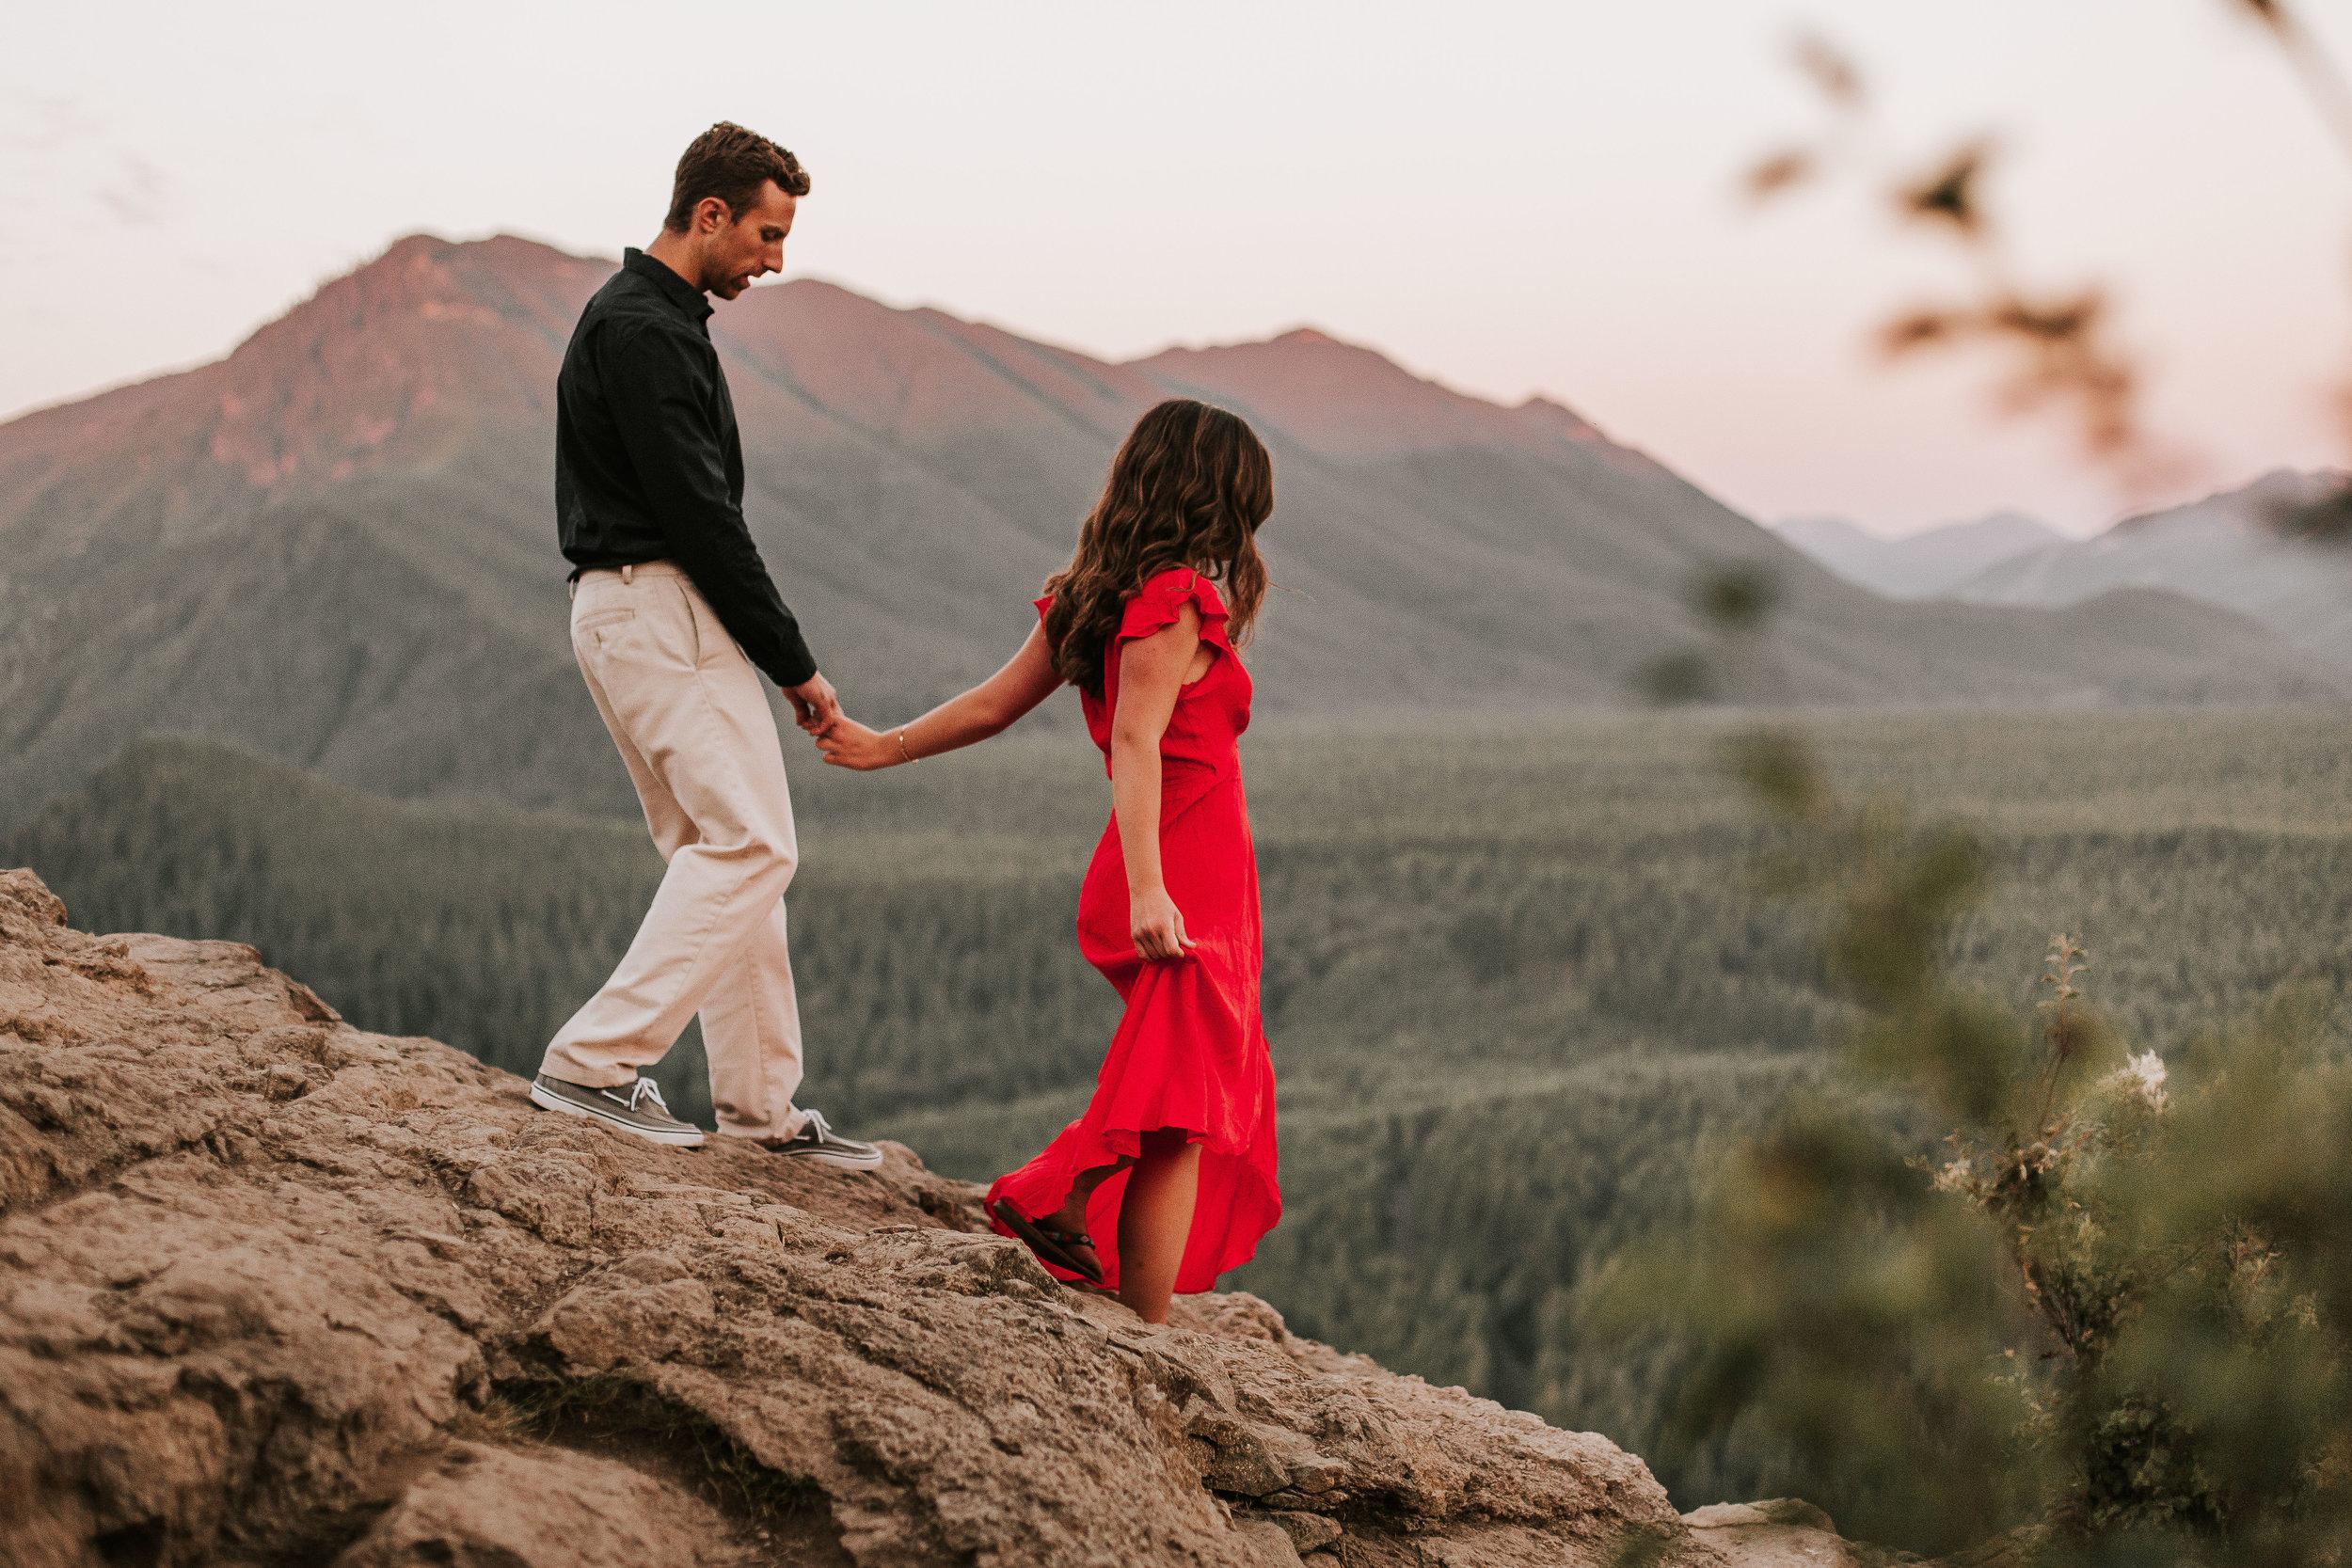 nicole-daacke-photography-rattlesnake-ridge-adventurous-engagement-session-hiking-seattle-washington-destinatino-elopement-intimate-wedding-photographer-30.jpg